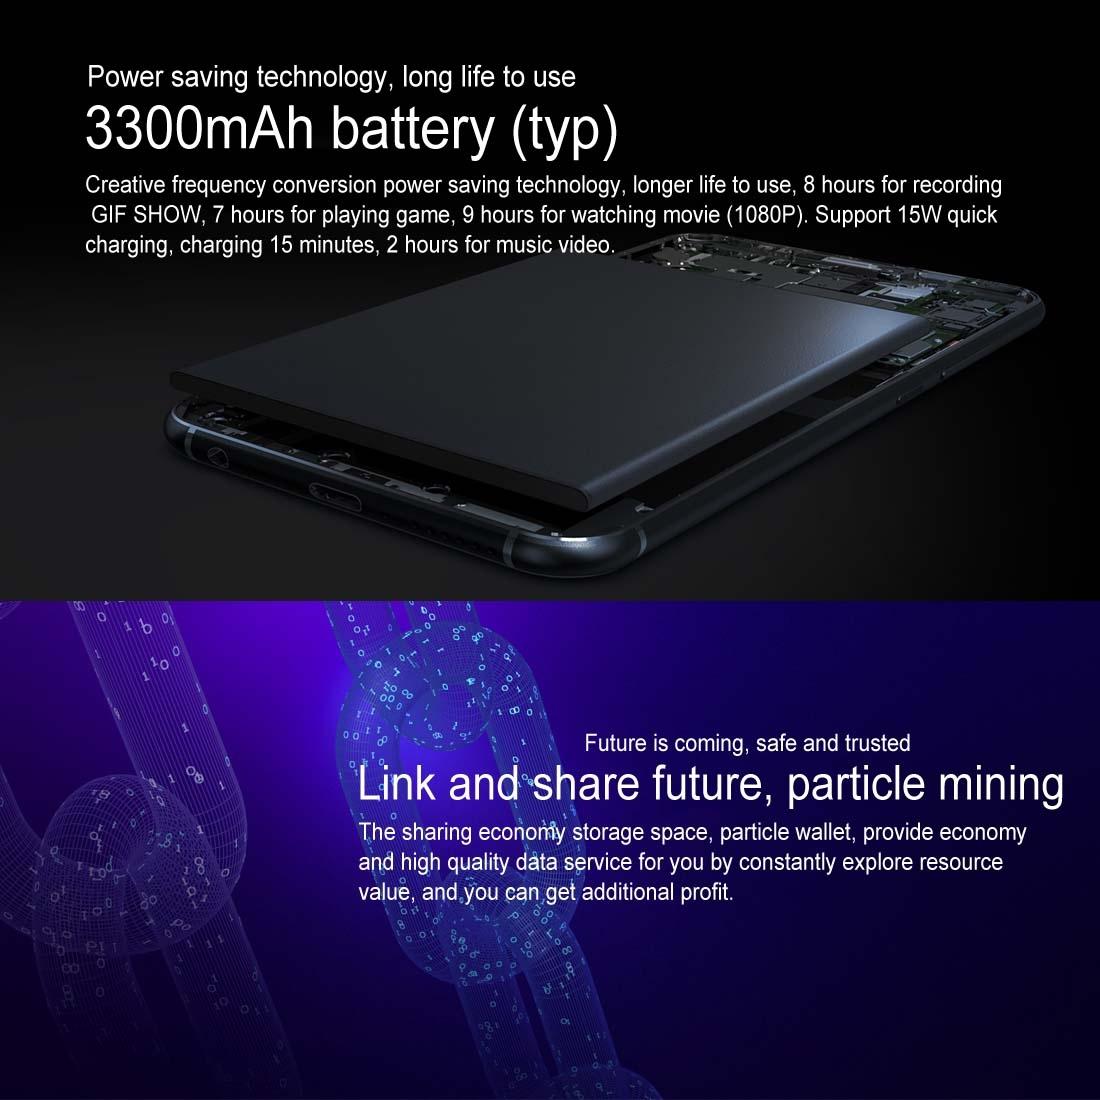 i.ibb.co/WxDk1wb/Smartphone-6-GB-64-GB-Lenovo-Z5-14.jpg